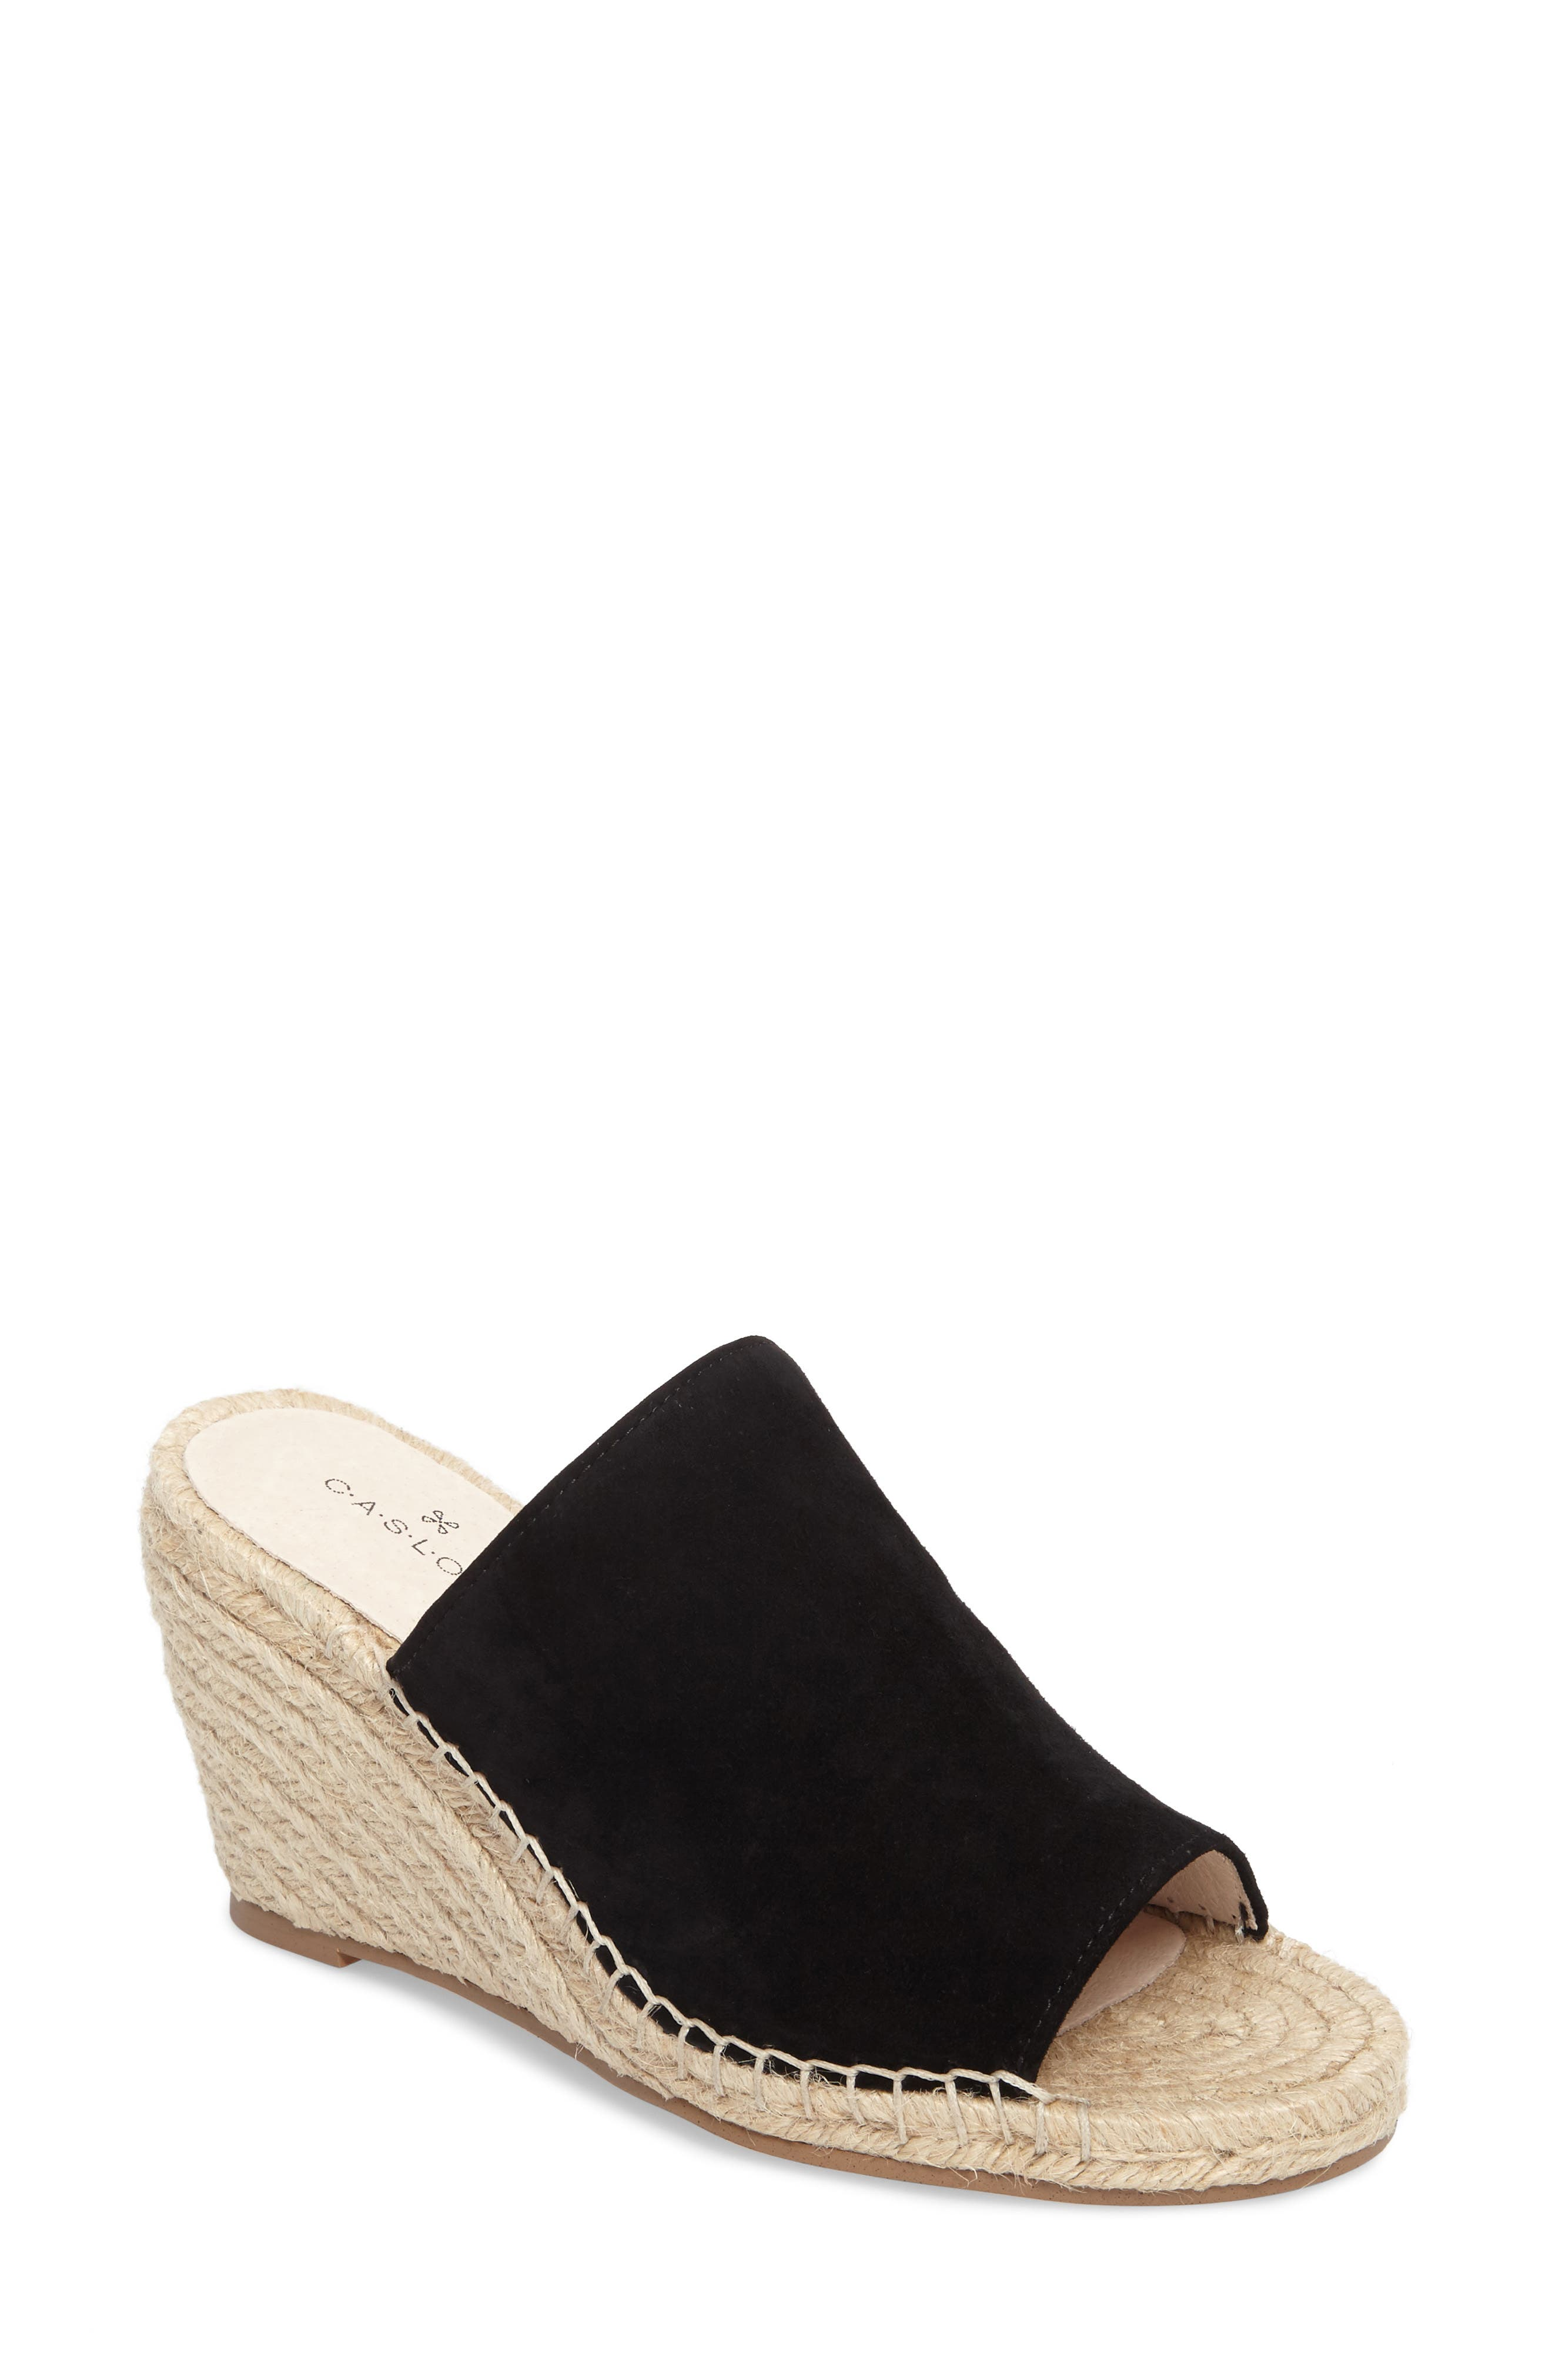 Sally Wedge Sandal,                         Main,                         color, BLACK SUEDE